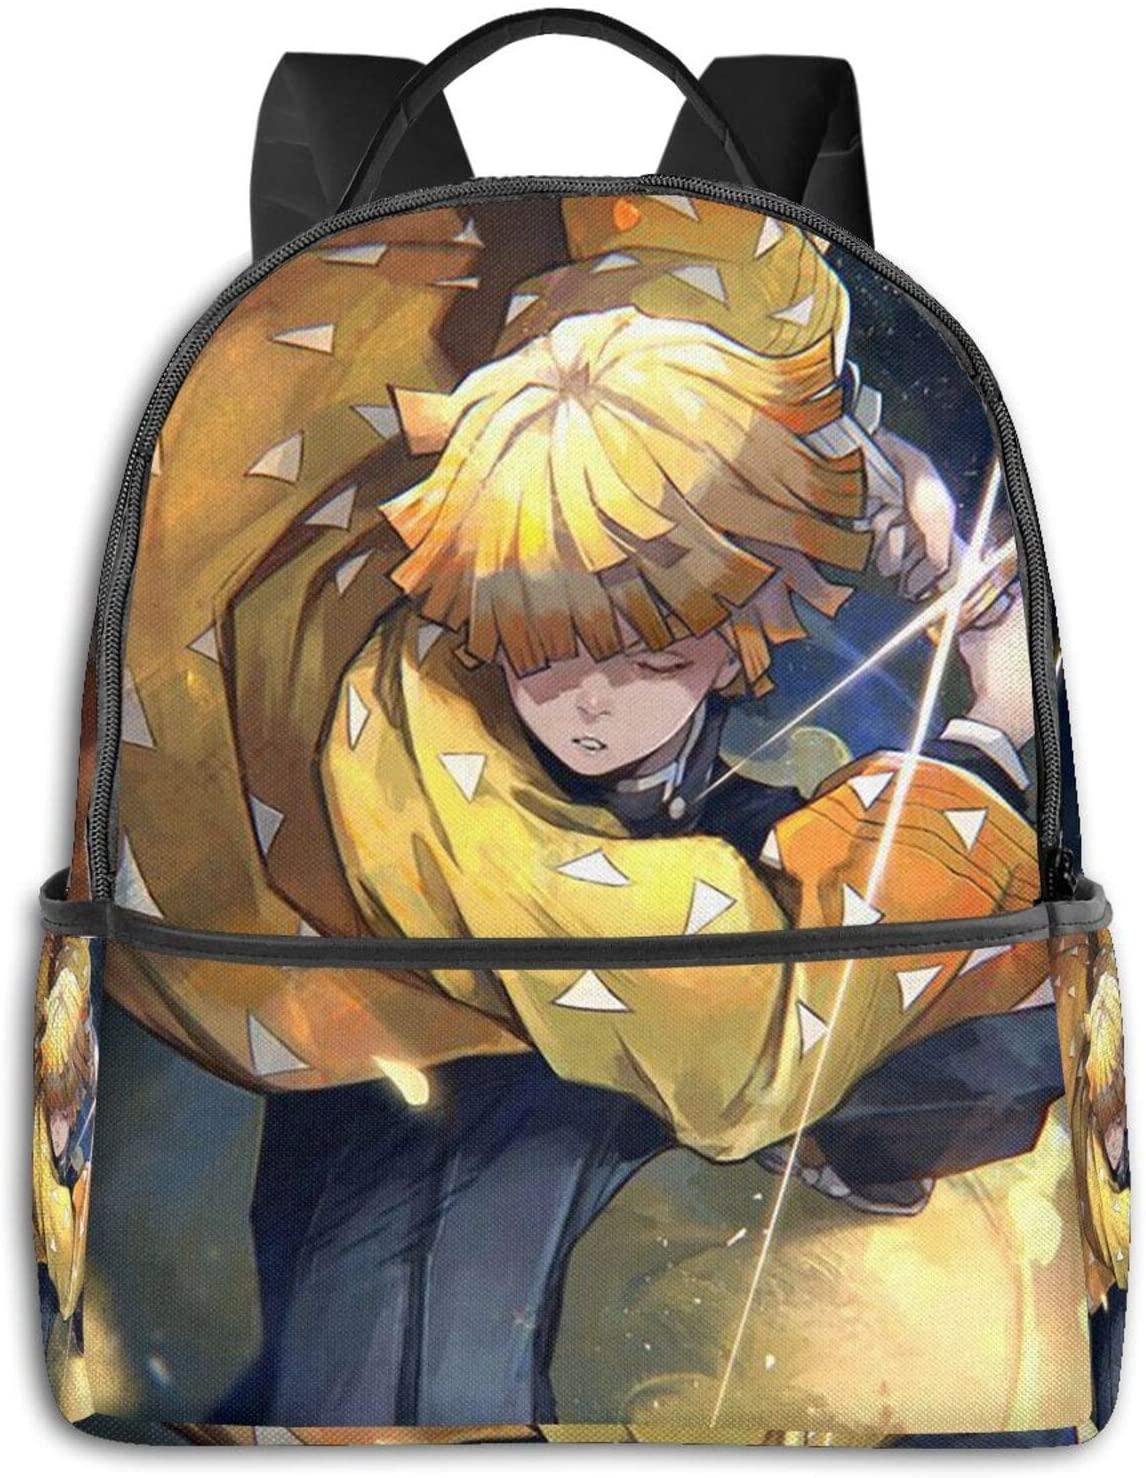 Demon Slayer Kimetsu no Yaiba Laptop Backpack Water Resistant Travel Bag, Durable Laptops Backpack for Women & Men College Bookbags